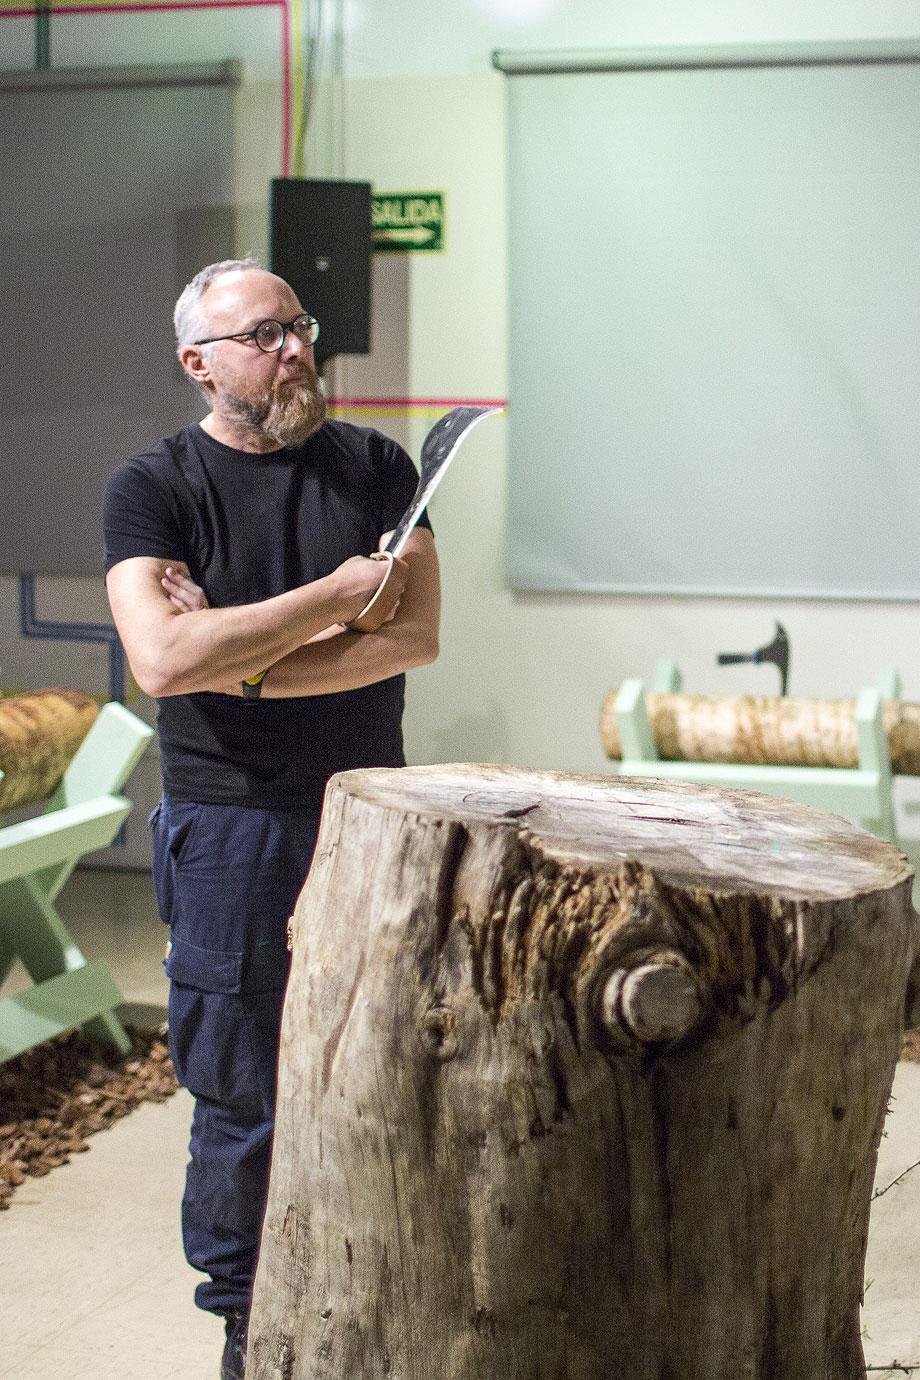 entrevista giulio iacchetti en italian design day - retrato diego iñiguez